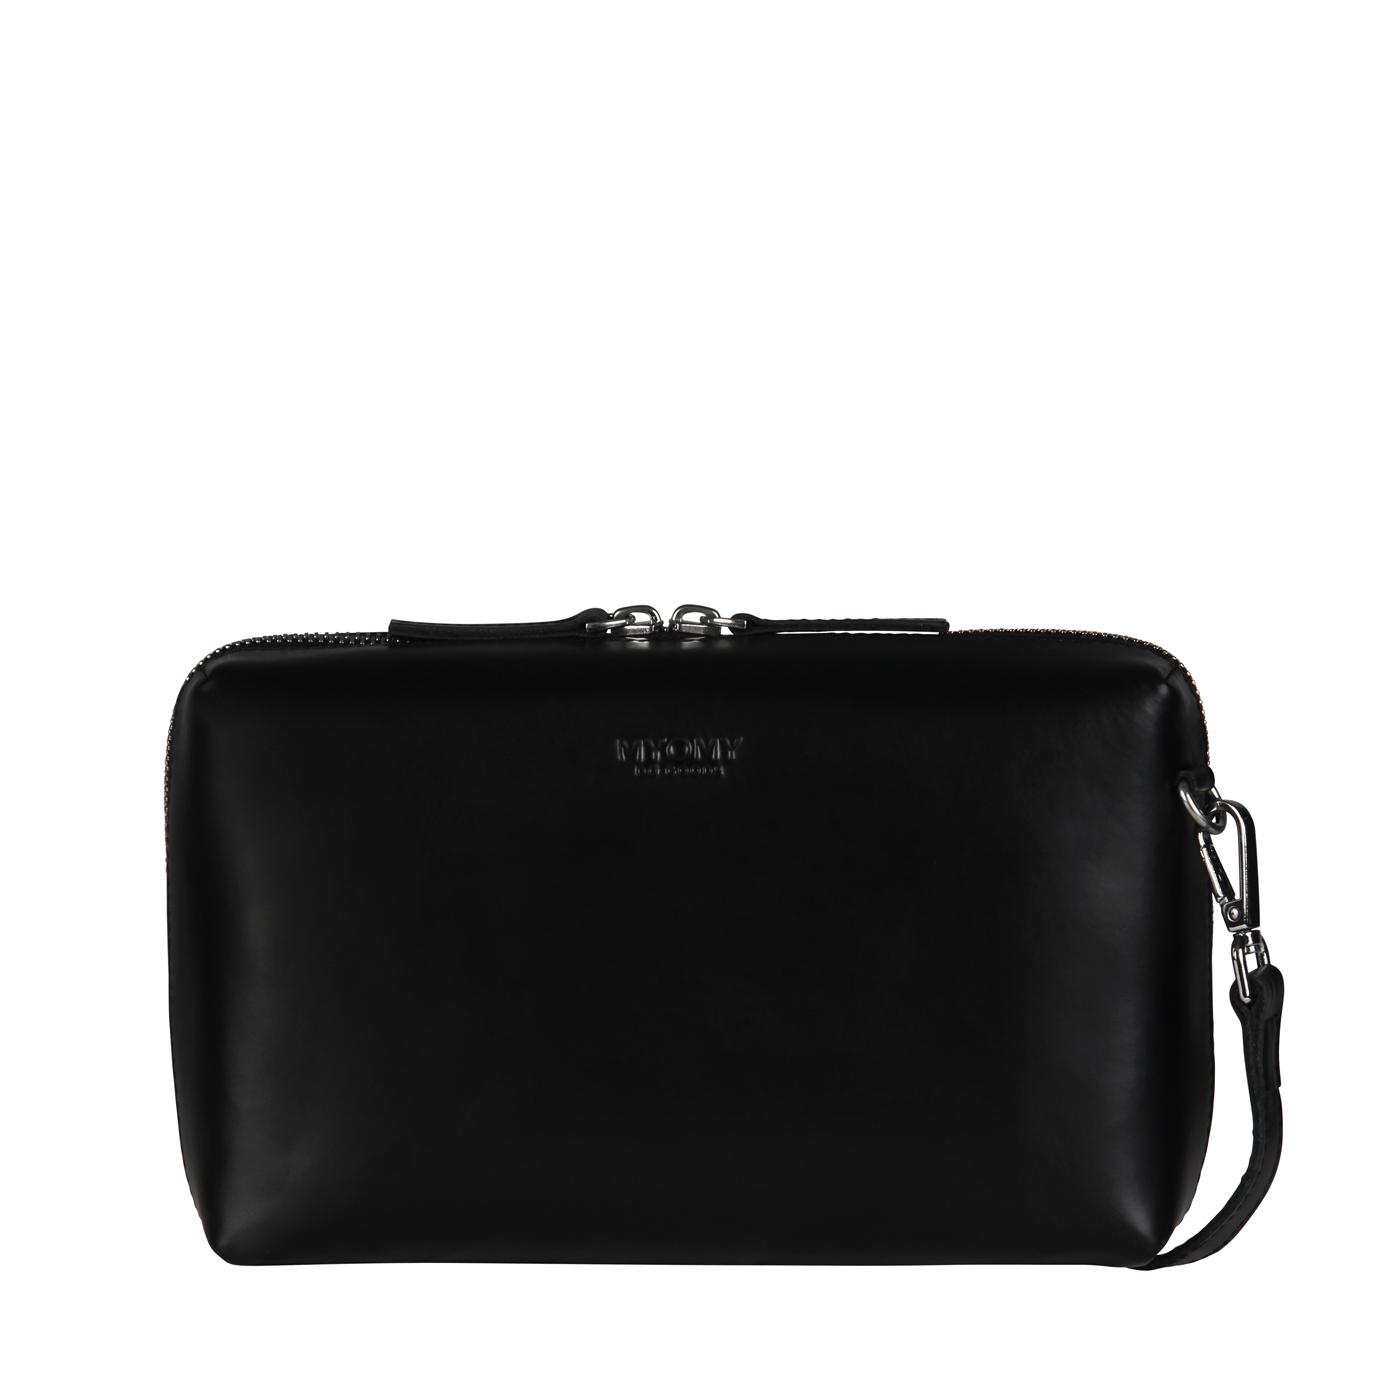 MY BOXY BAG Handbag - hunter waxy black